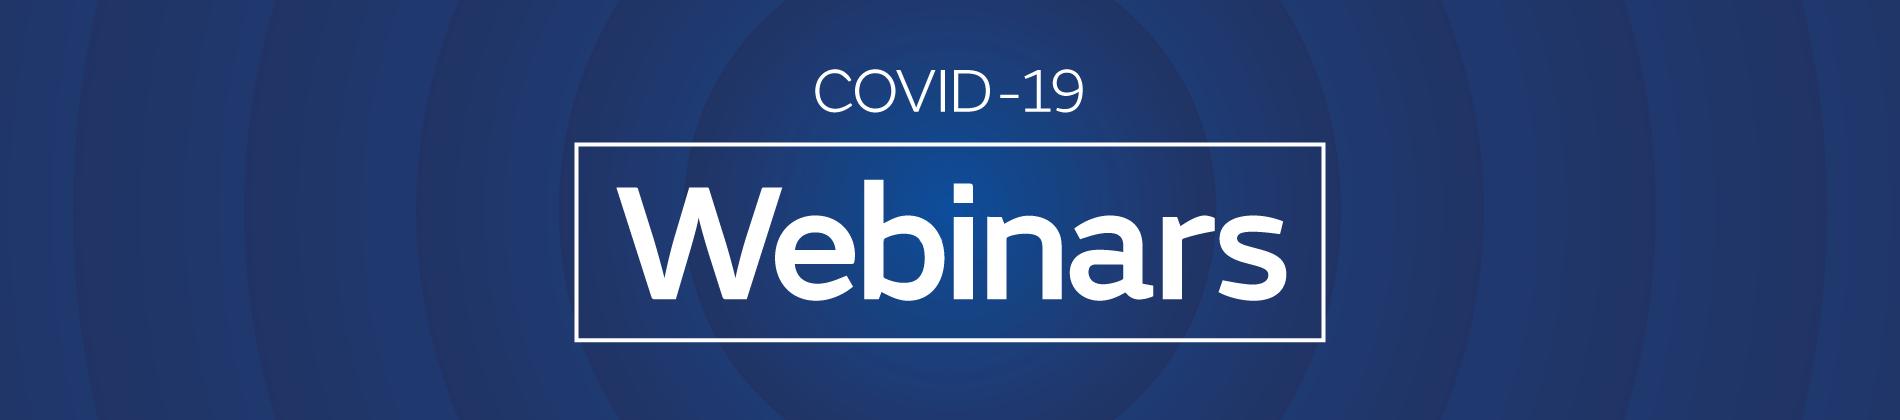 COVID-19 webinars banner